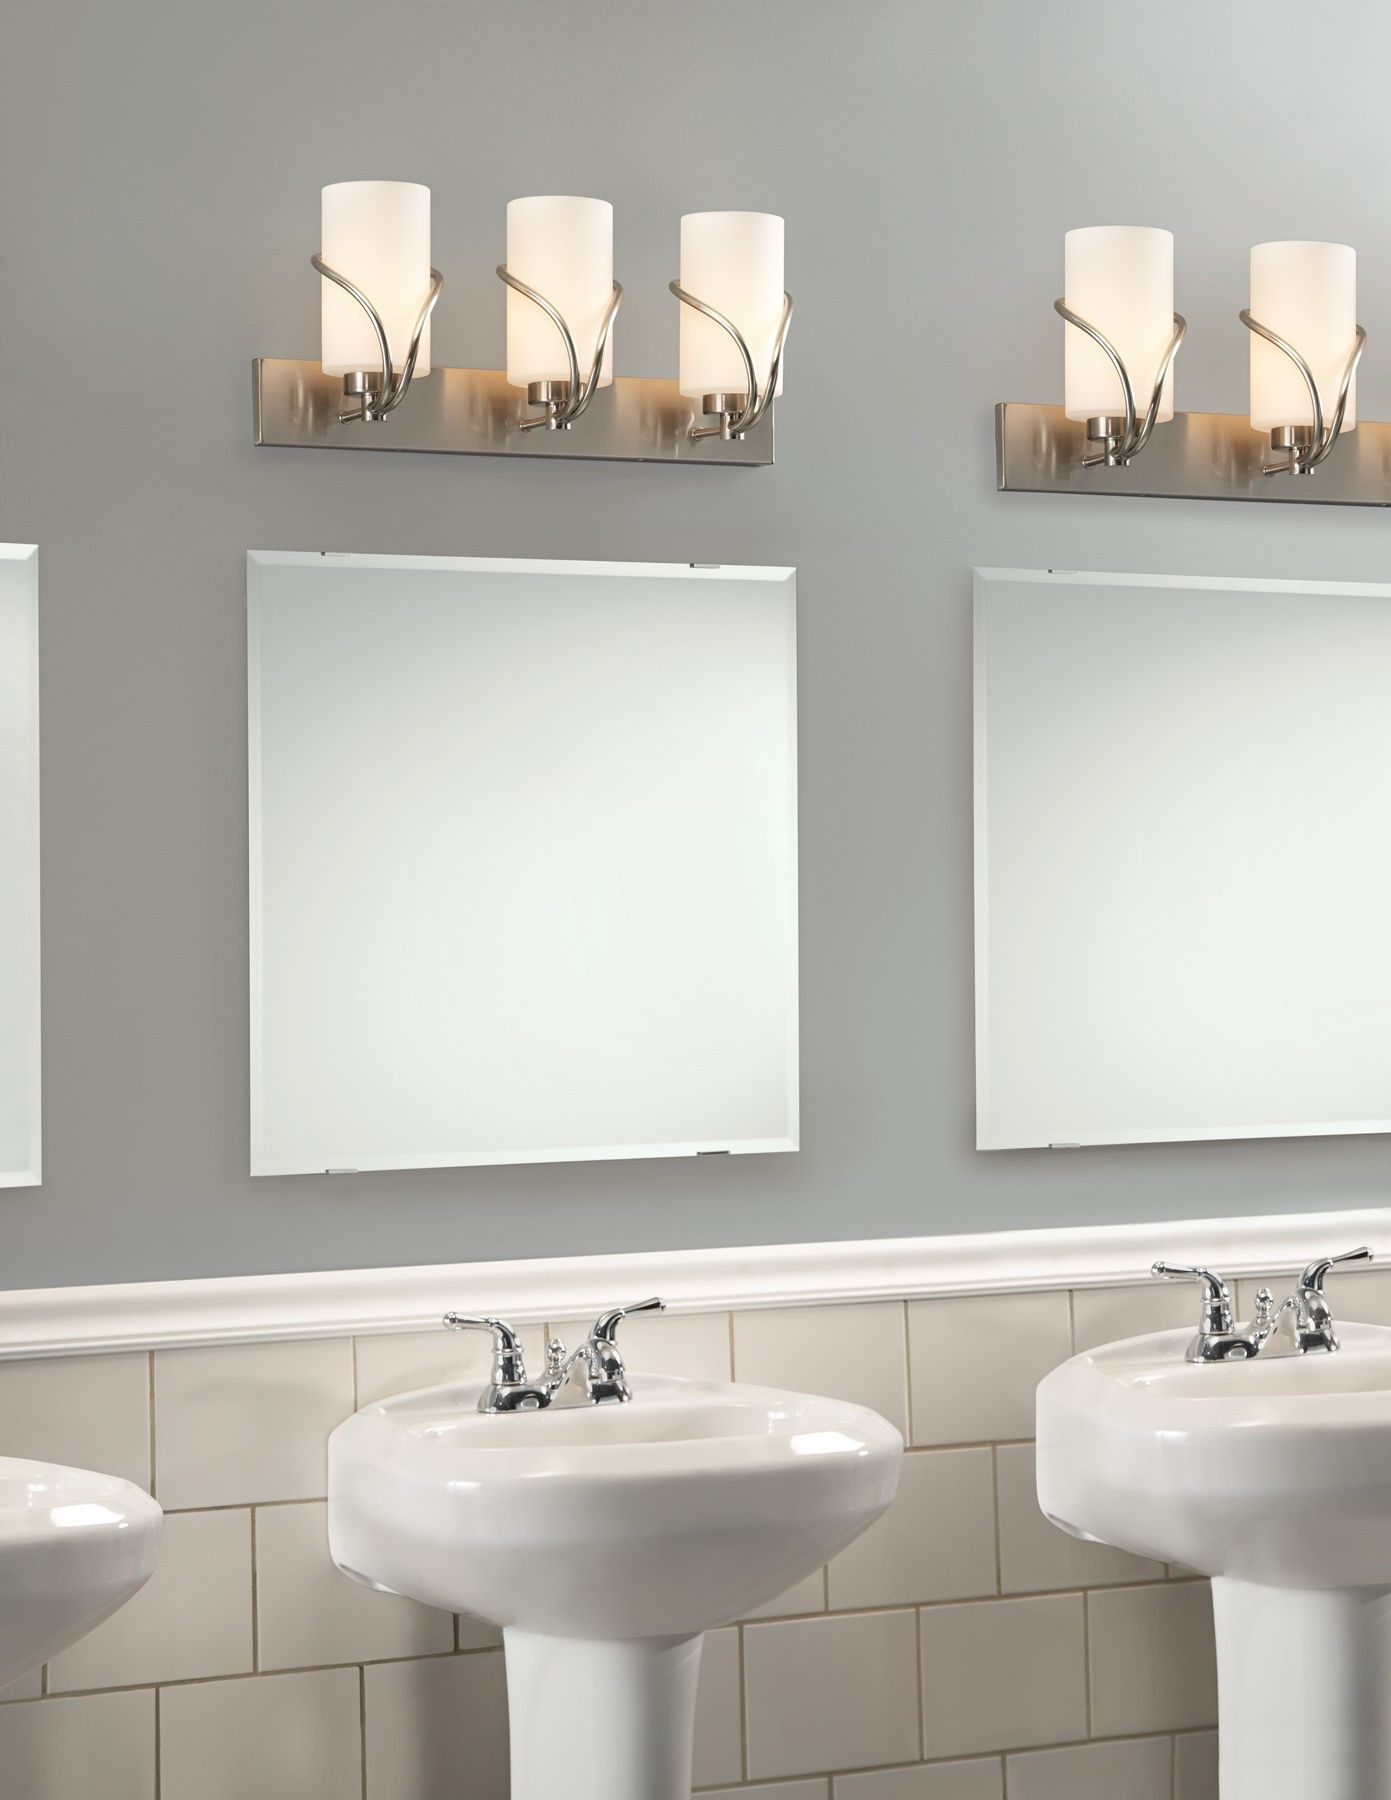 Photo of 10 Gorgeous Bathroom Light Fixtures Ideas – Get Ideas